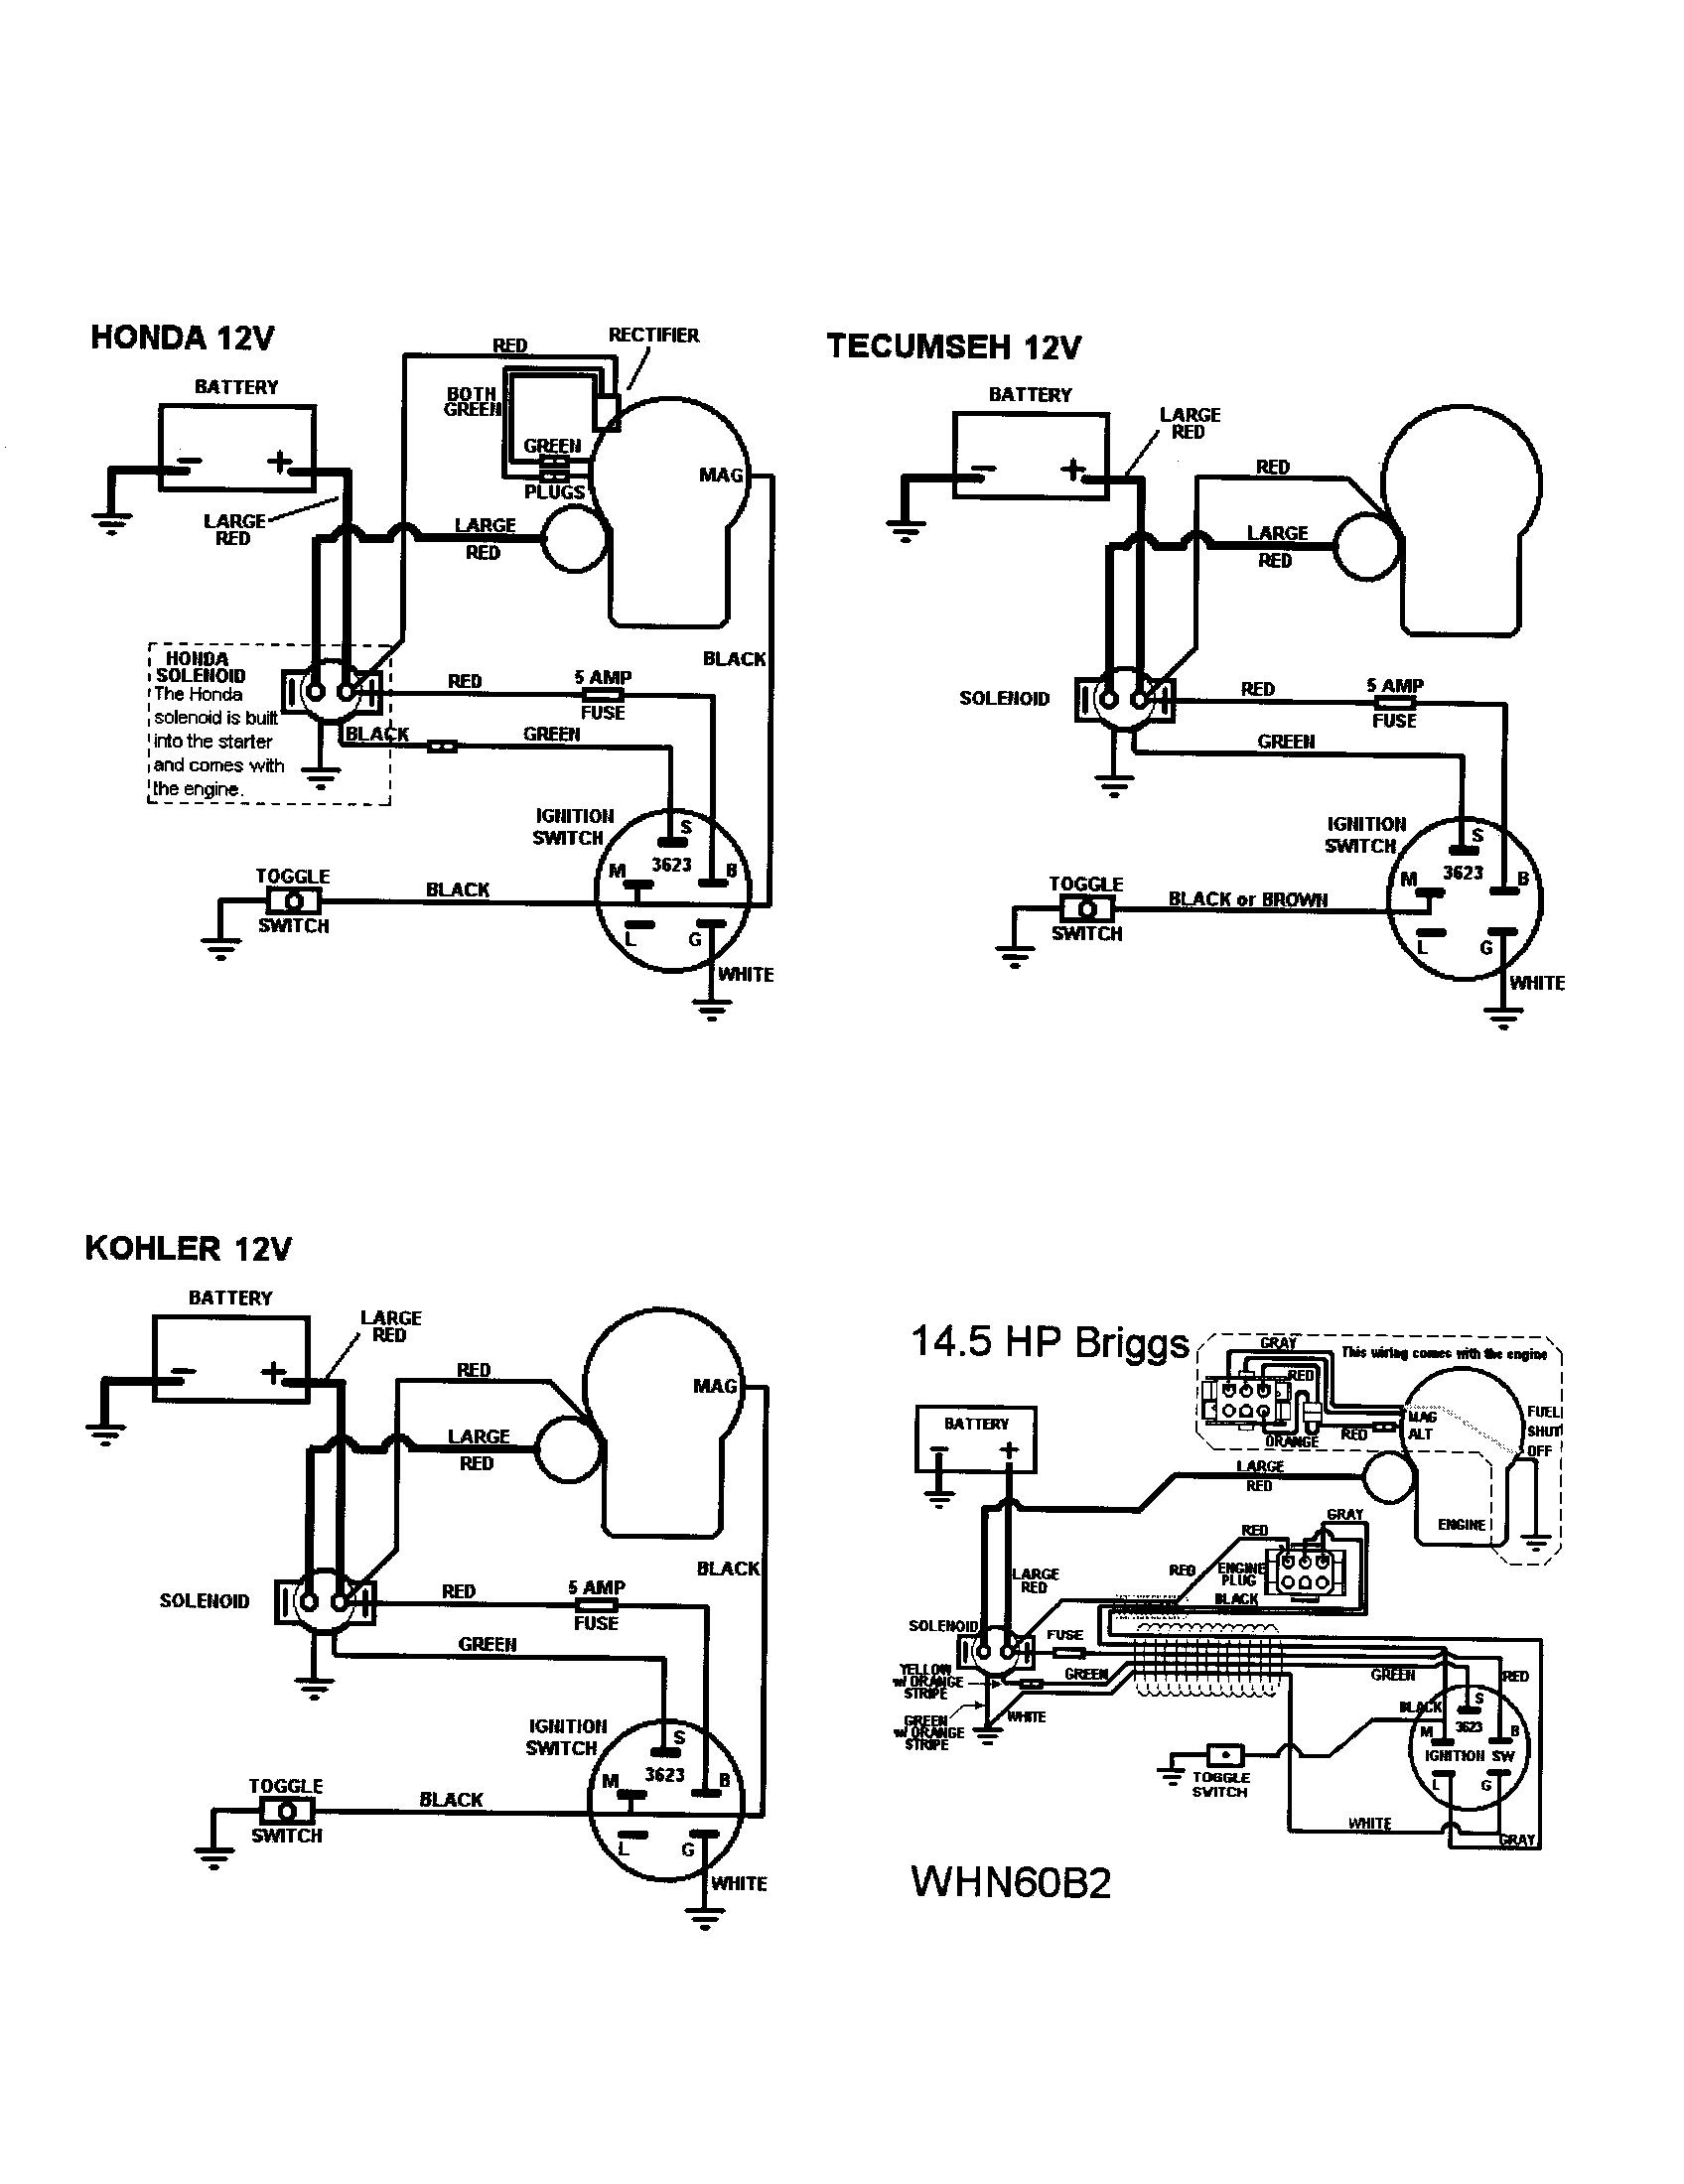 John Deere 60 Wiring Diagram 06 F150 Radio Wiring Diagram Toshiba Ke2x Jeanjaures37 Fr